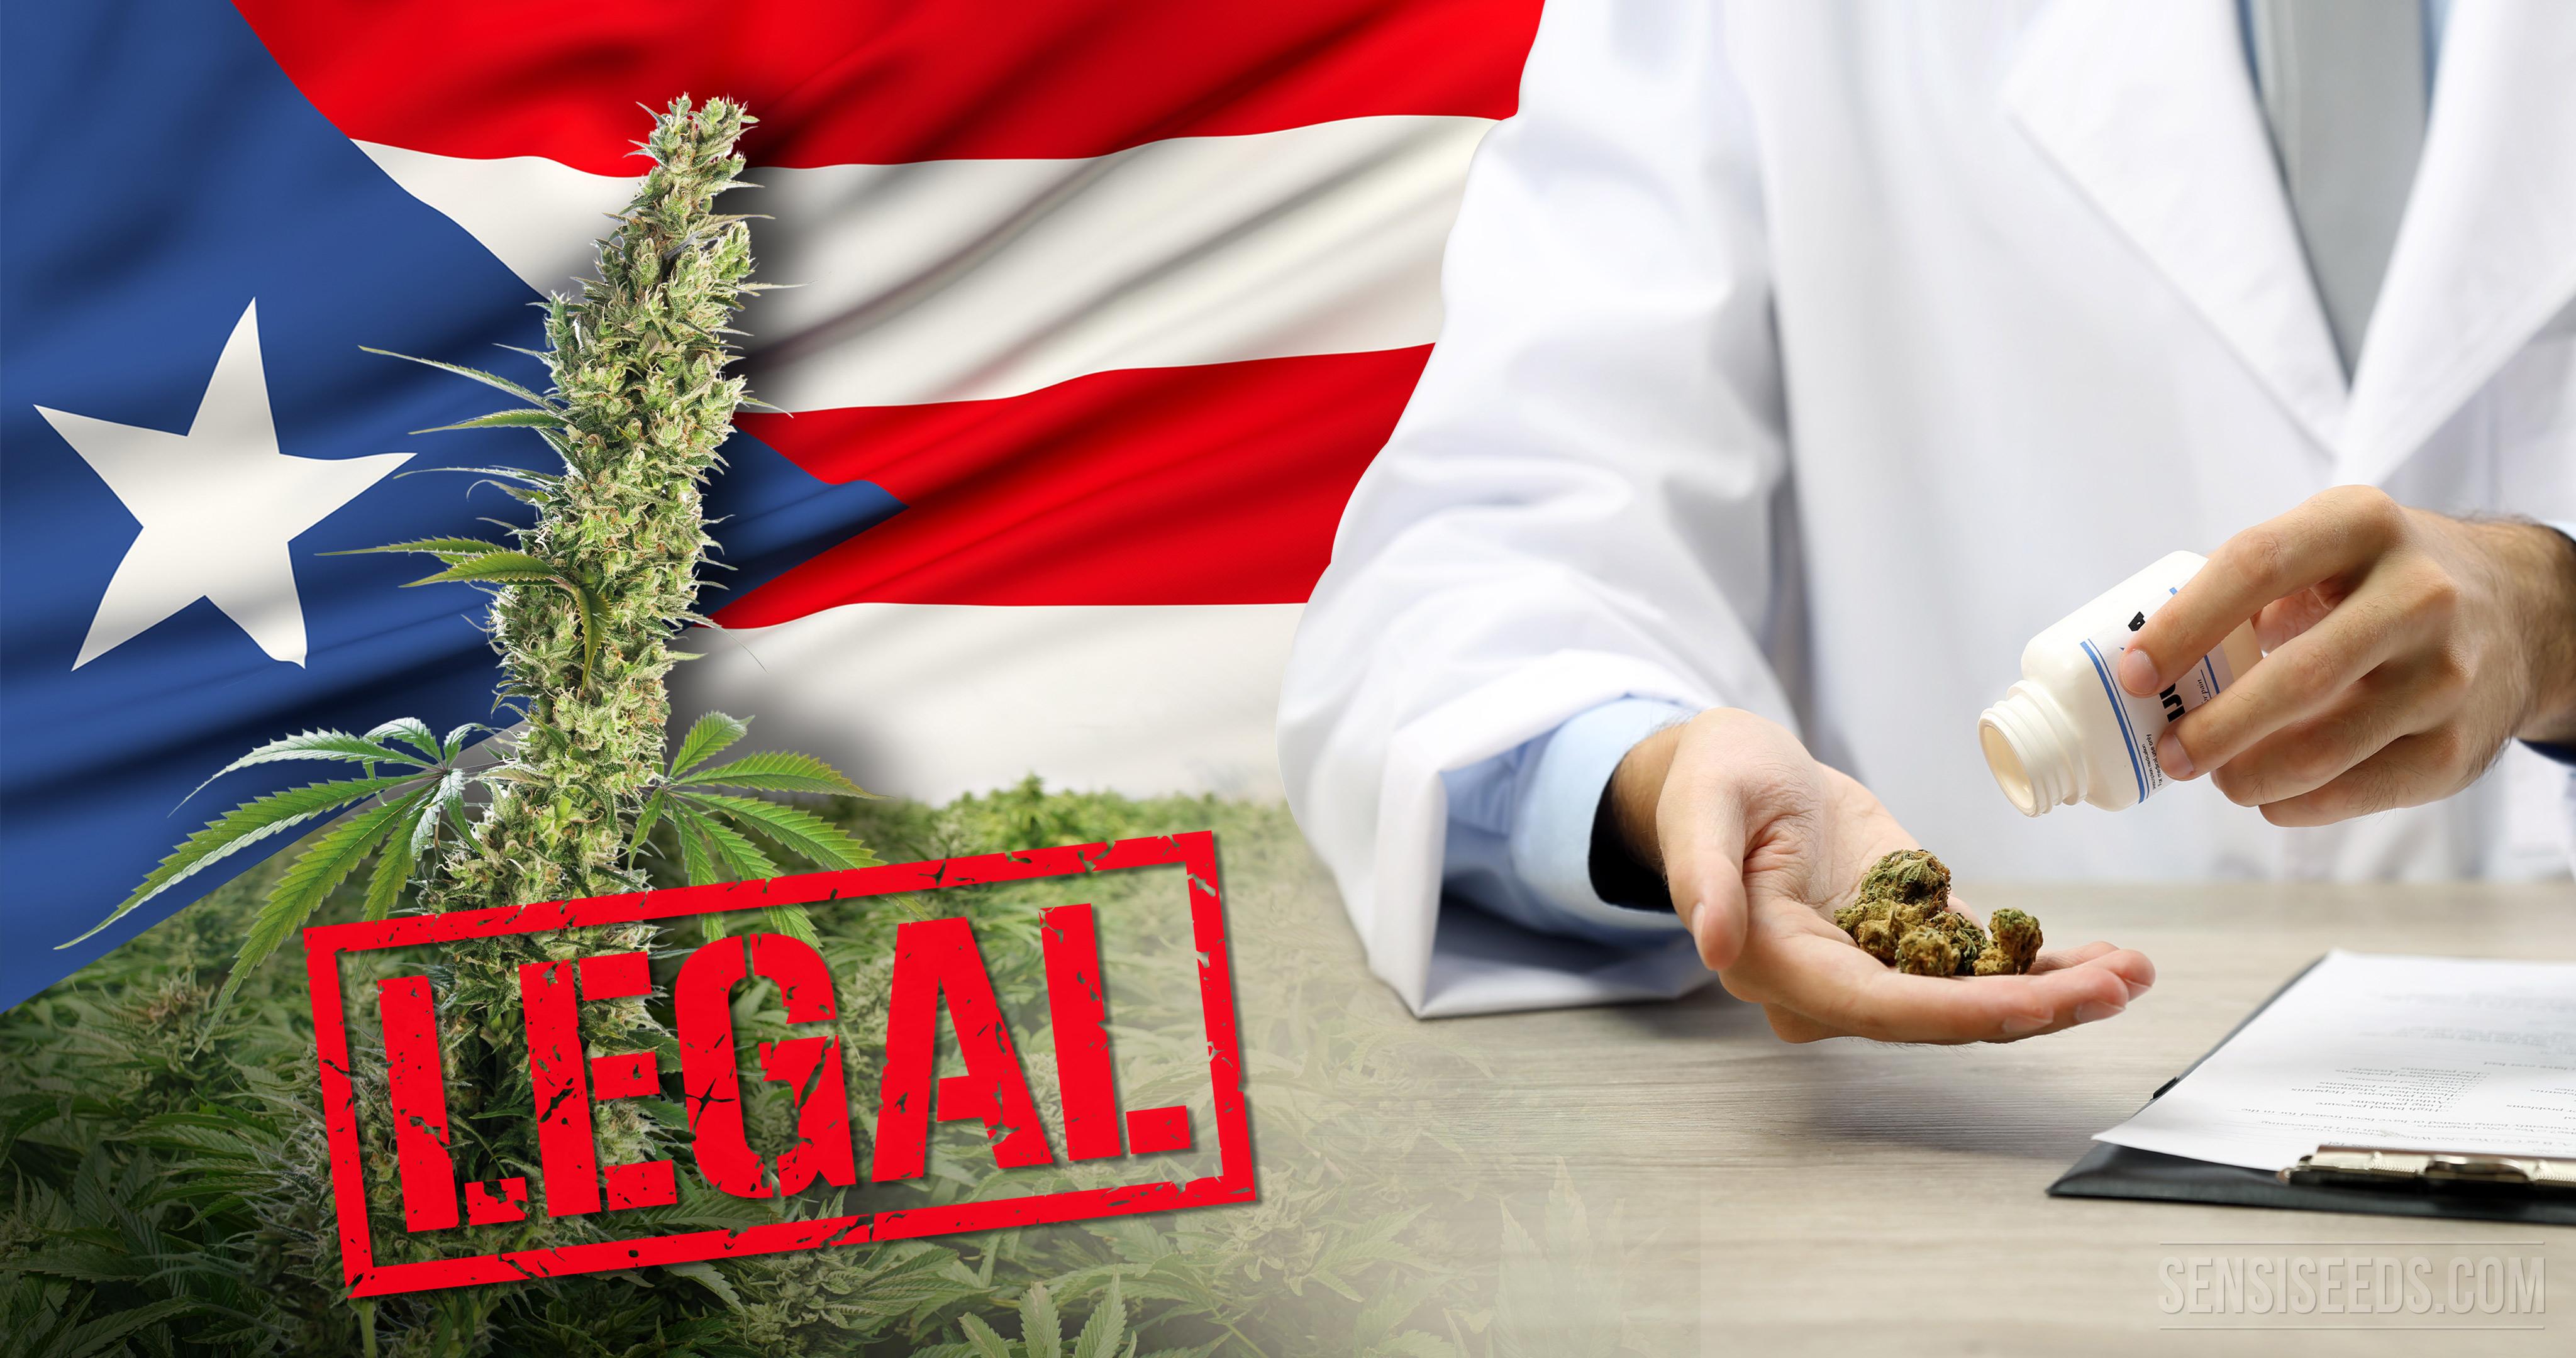 puerto-rico-licenses-for-growing-medicinal-cannabis-4k